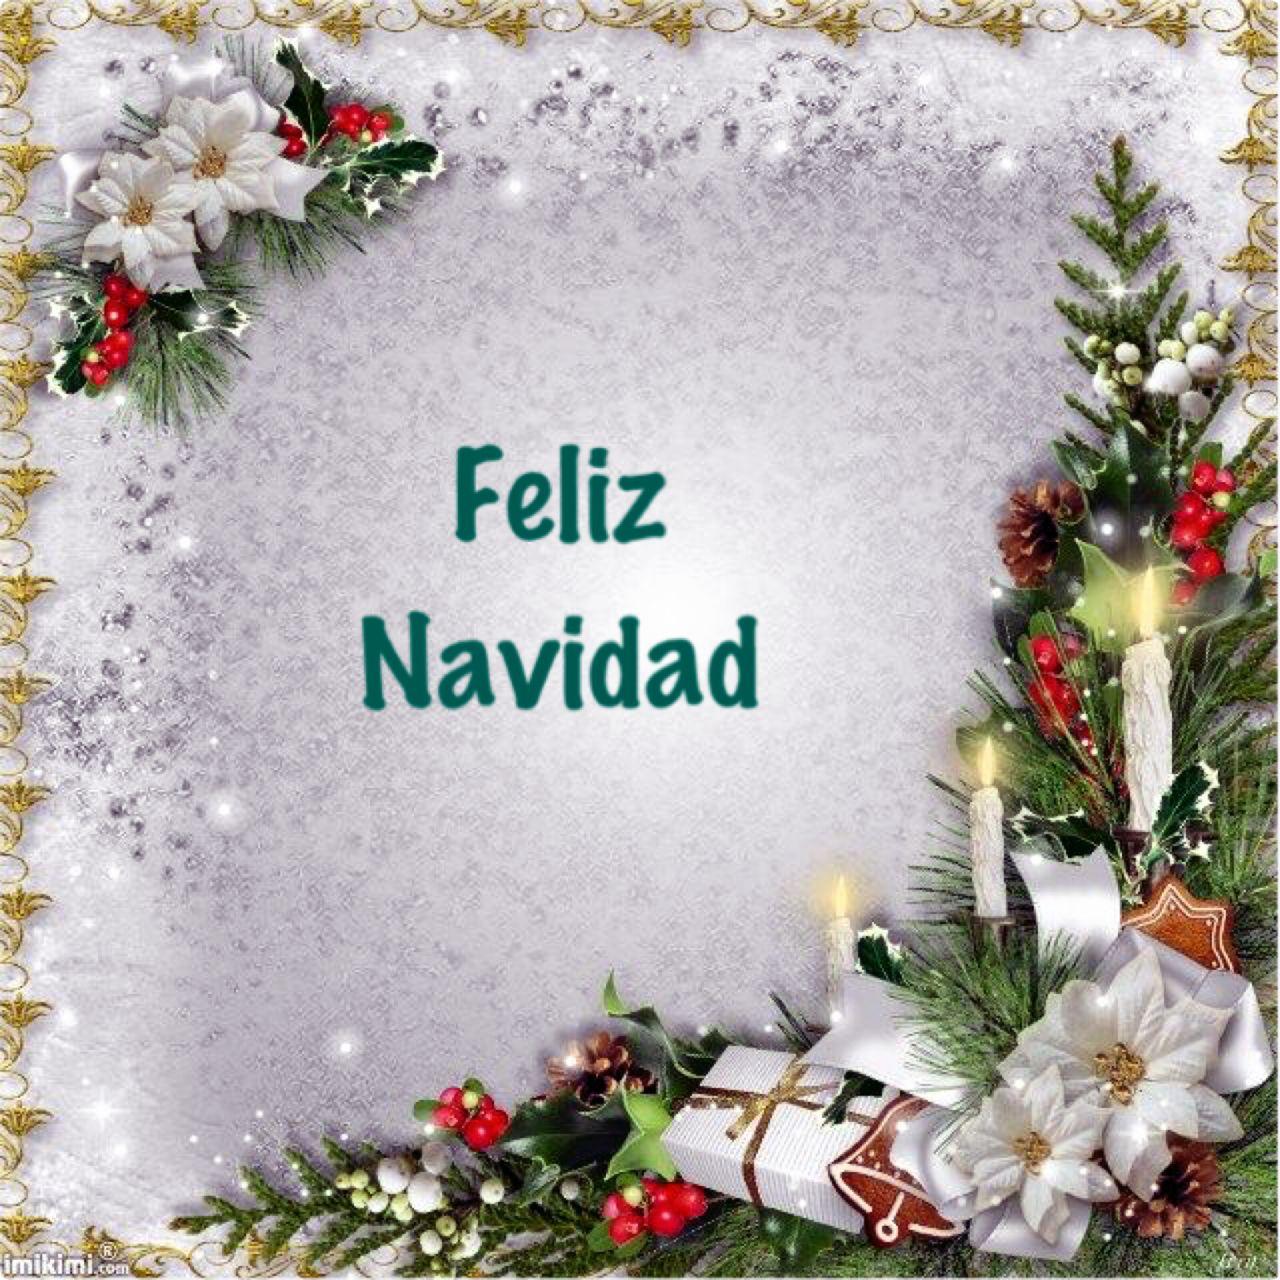 Pin by Diana Rios on Feliz Navidad | Pinterest